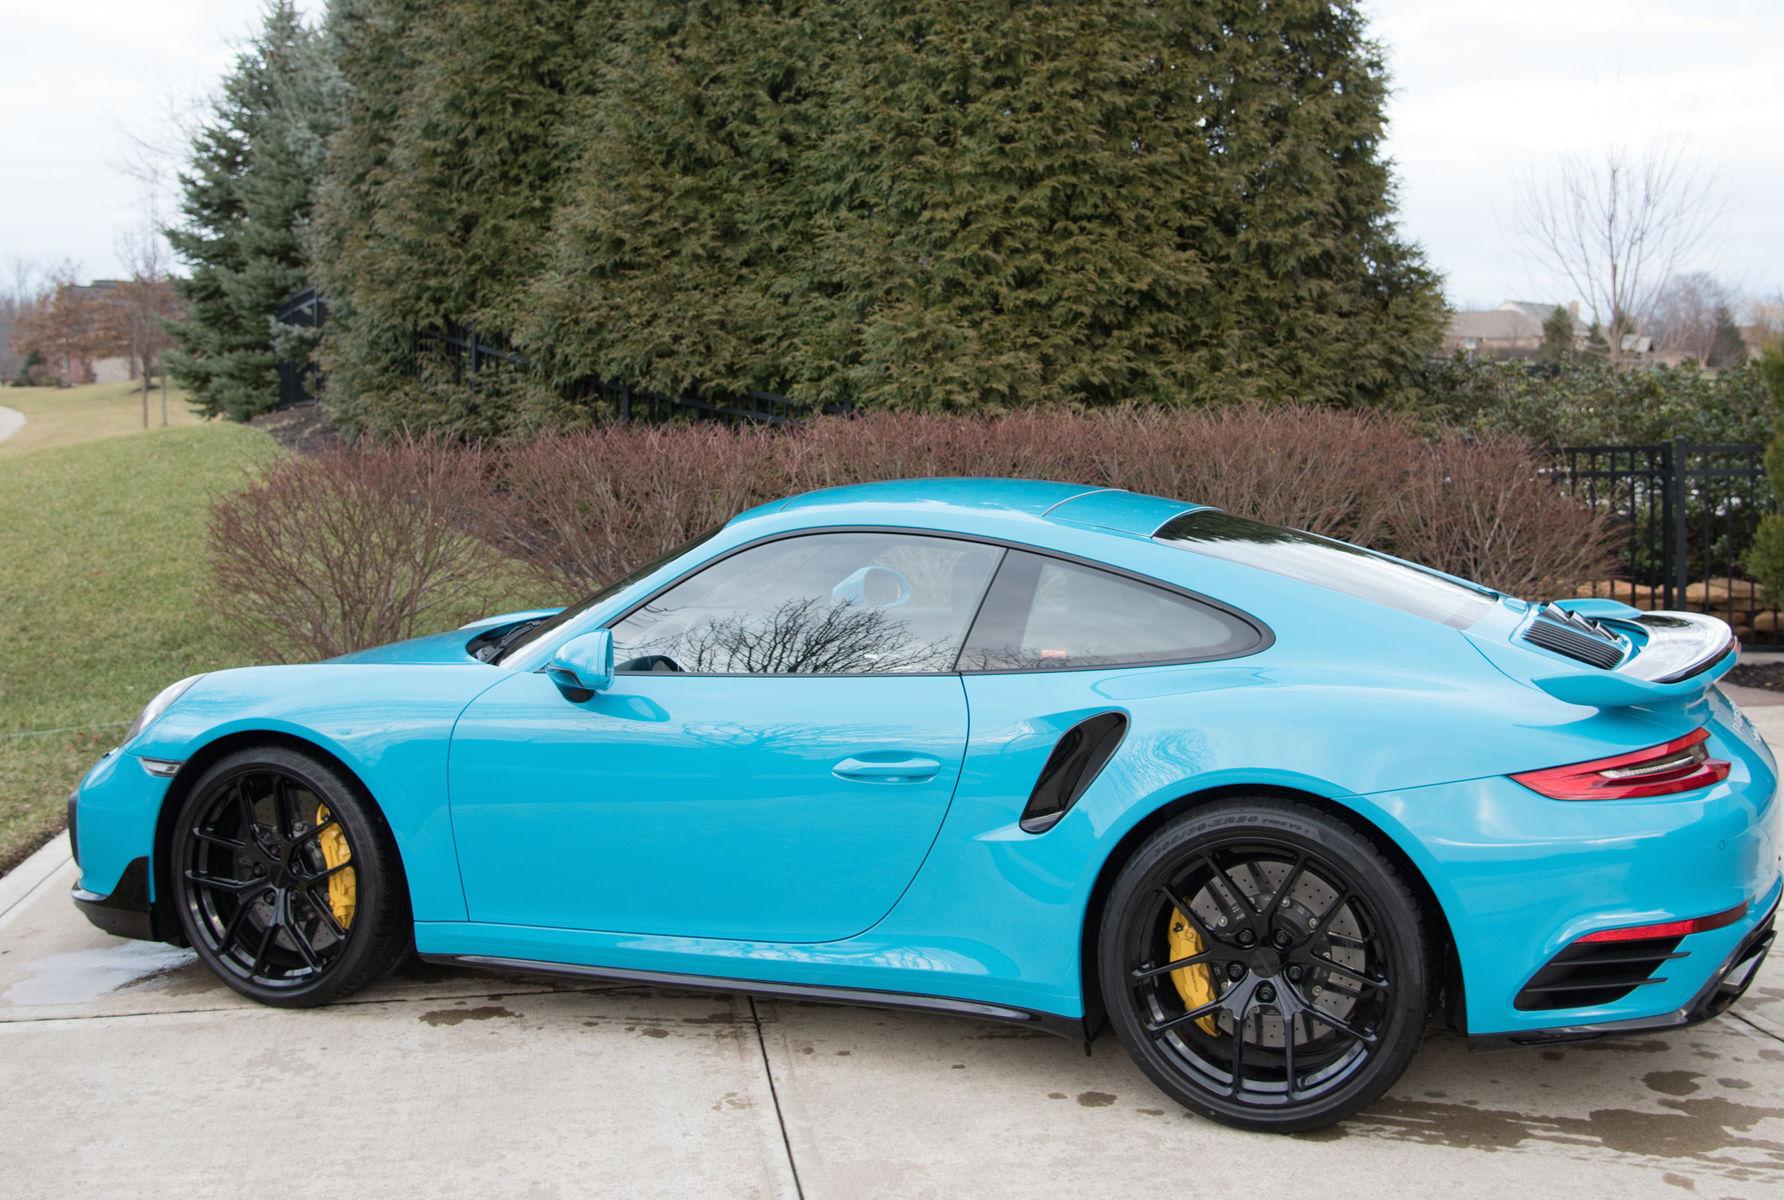 2017 Porsche 911 | Mike Martin's Maui Blue 991 Porsche 911 Turbo S on Forgeline One Piece Forged Monoblock VX1R Wheels